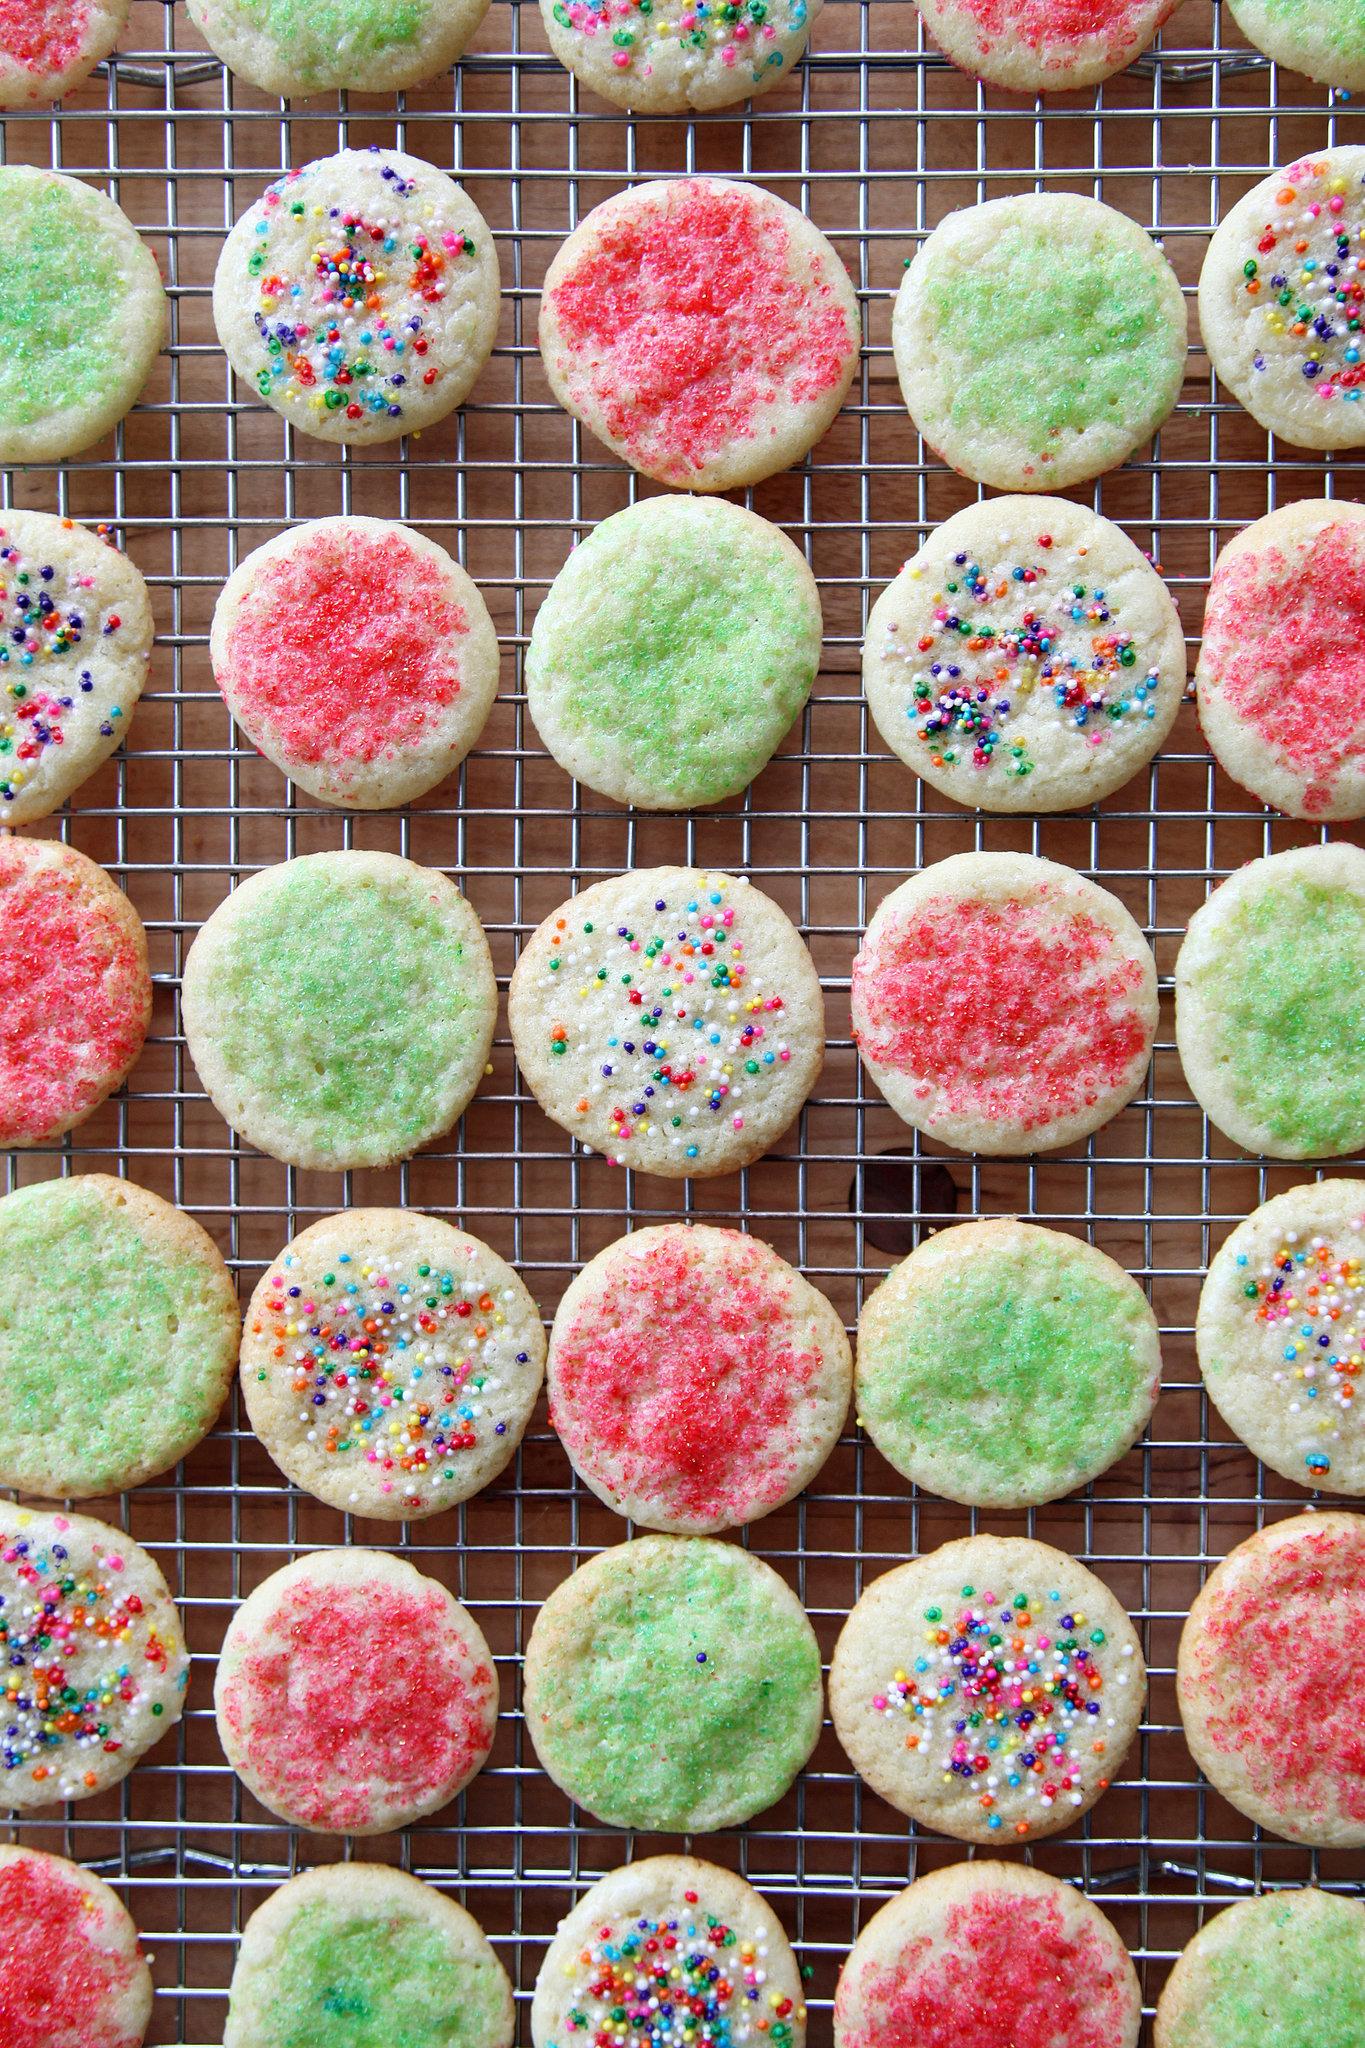 04c25e54129479c9_Chewy-Sugar-Cookies.xxxlarge_2x.jpg